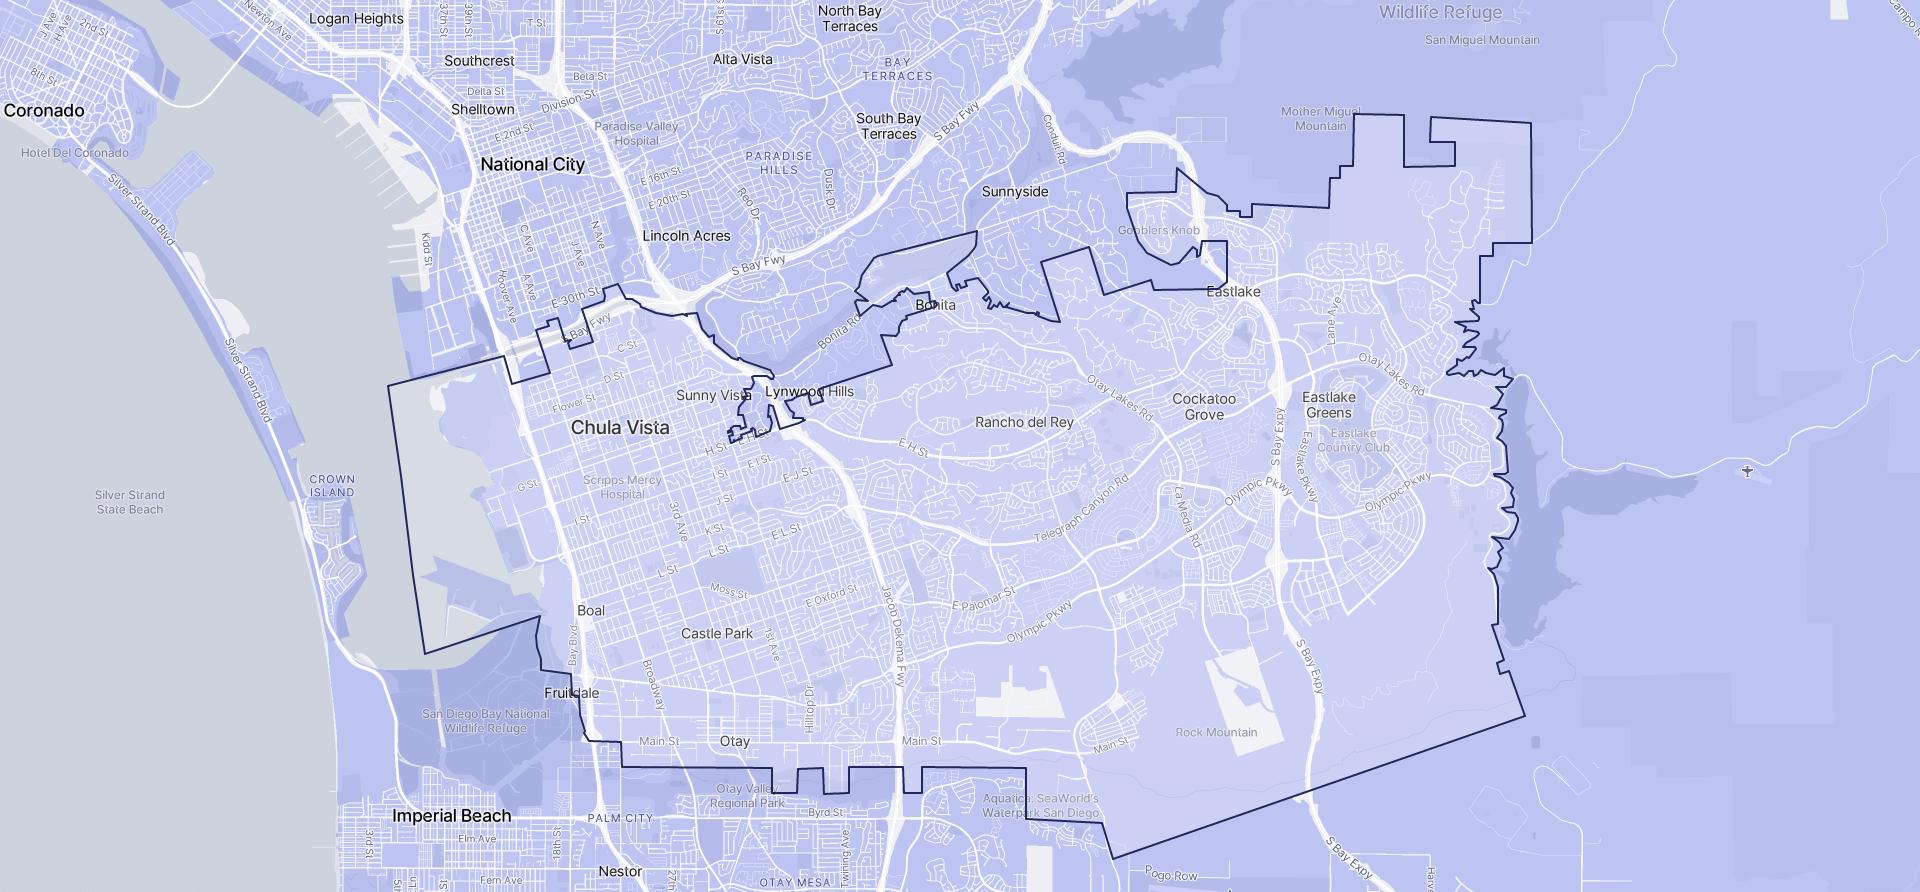 Image of Chula Vista boundaries on a map.